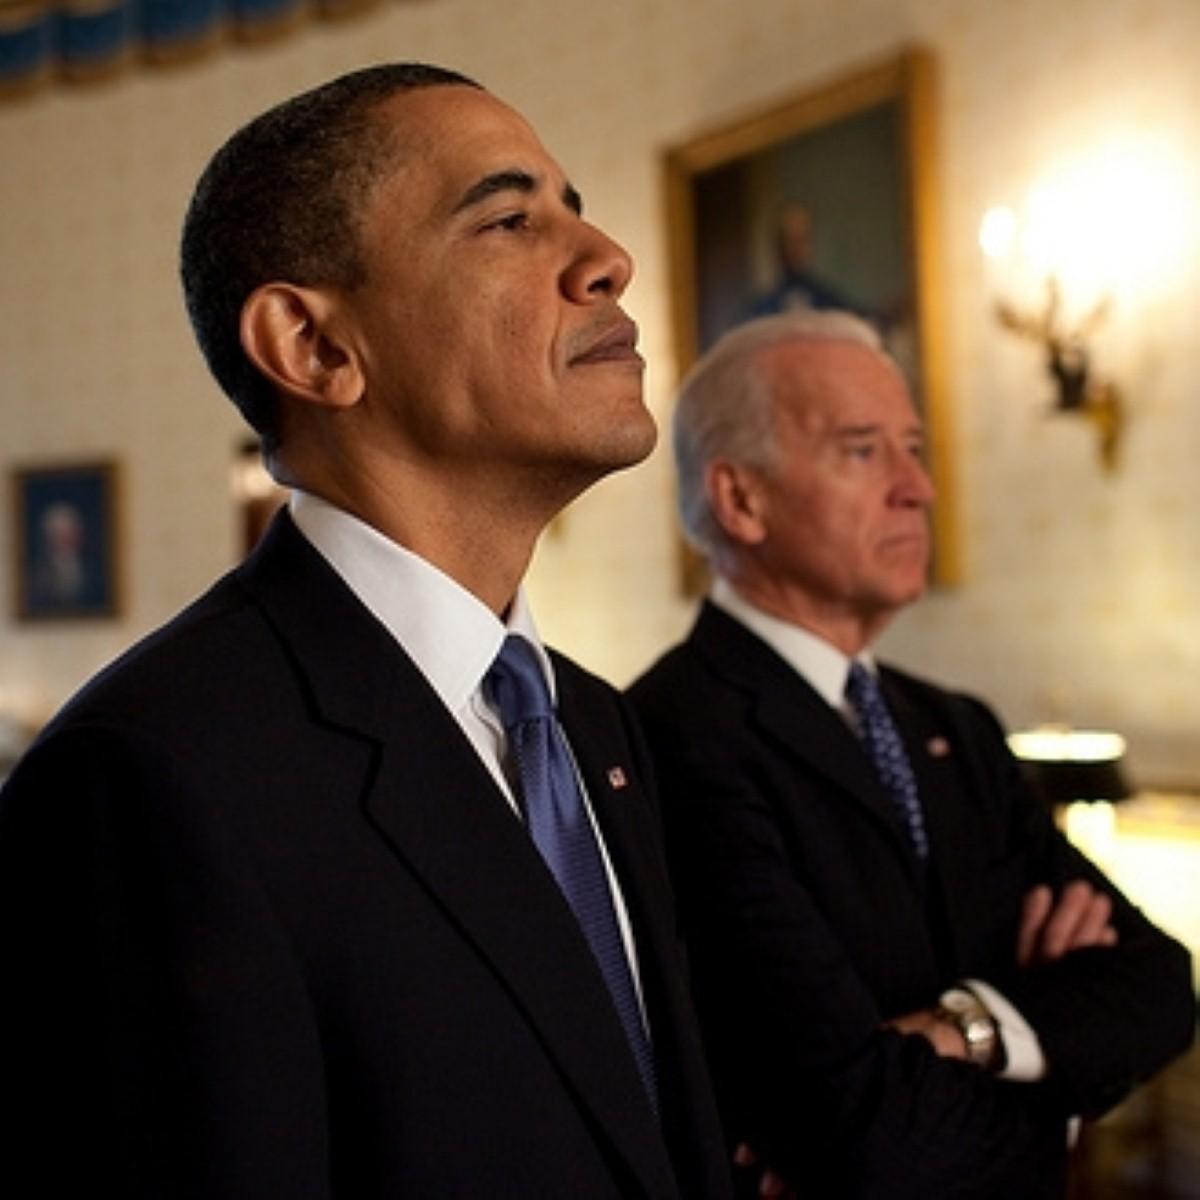 Joe Biden, Barack Obama's vice-president, will visit London early next week.